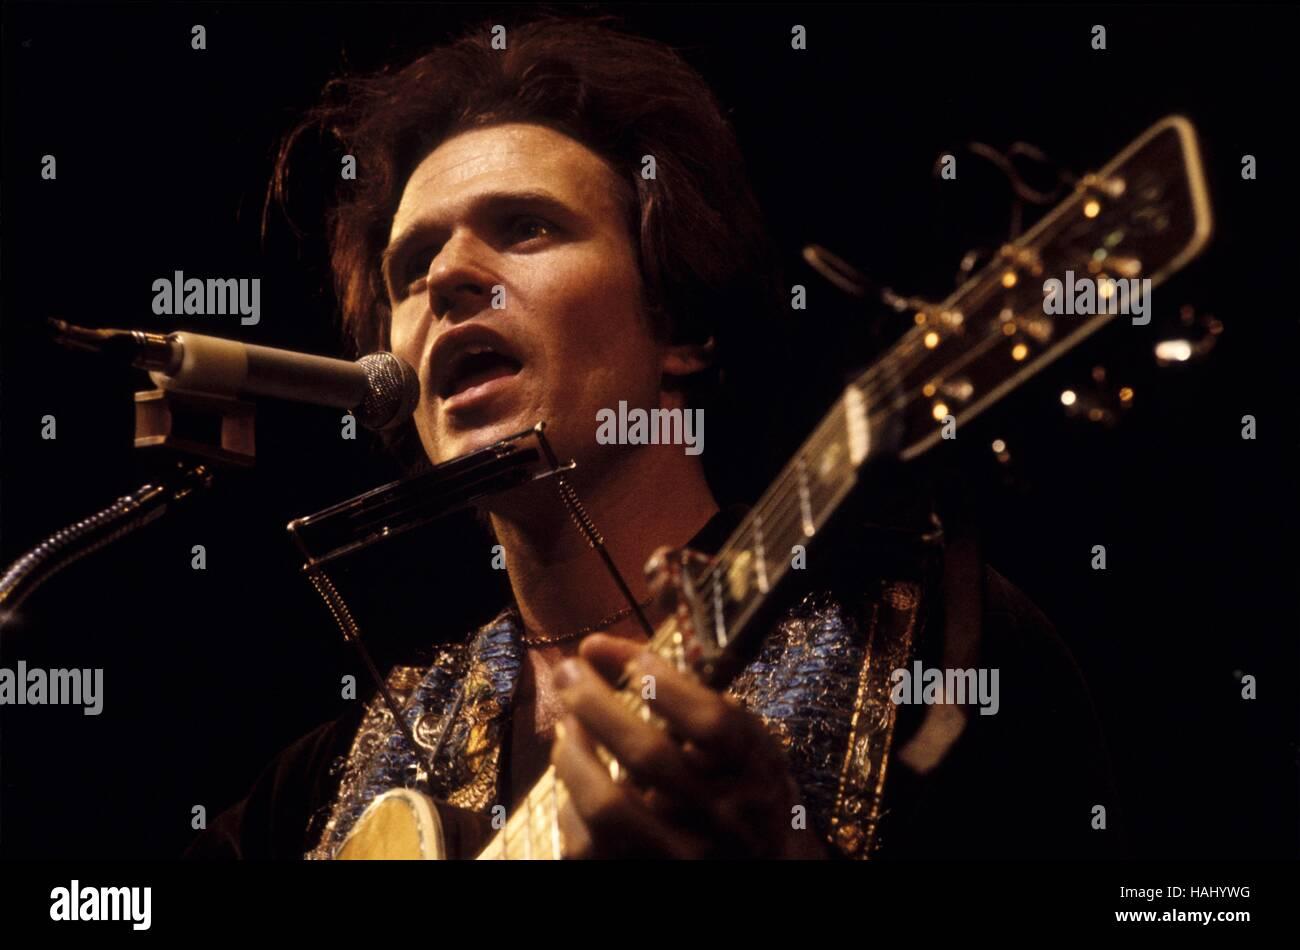 Country Joe McDonald - 28/03/1971 - Francia / Ile-de-France (Regione) / Parigi - Concerto Country Joe McDonald, Immagini Stock